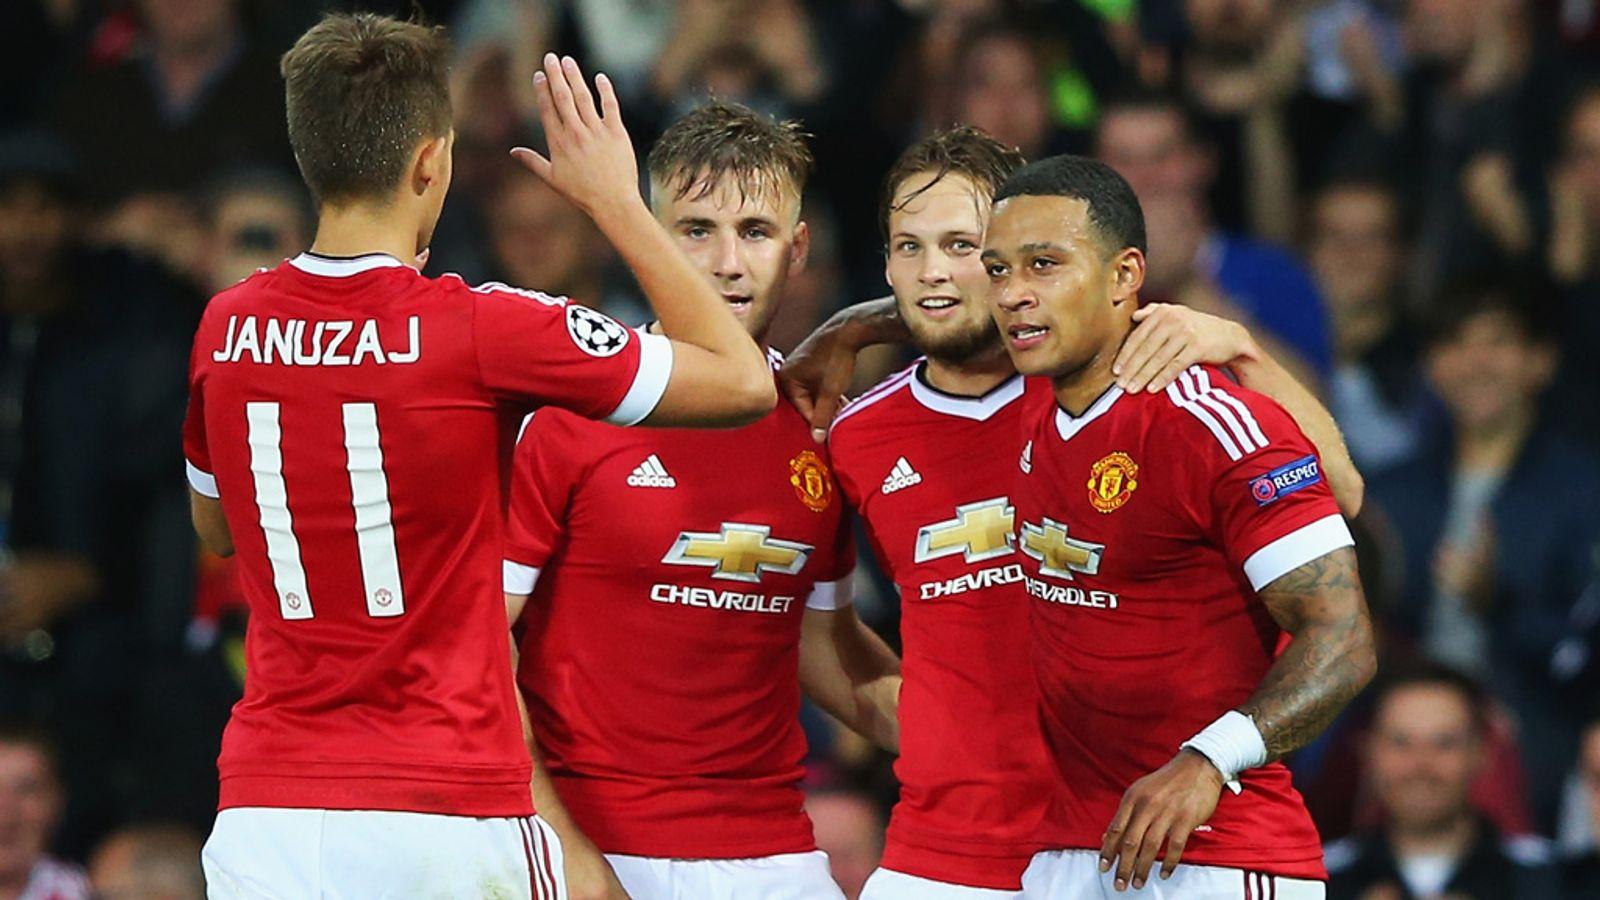 club brugge vs man united - photo #48